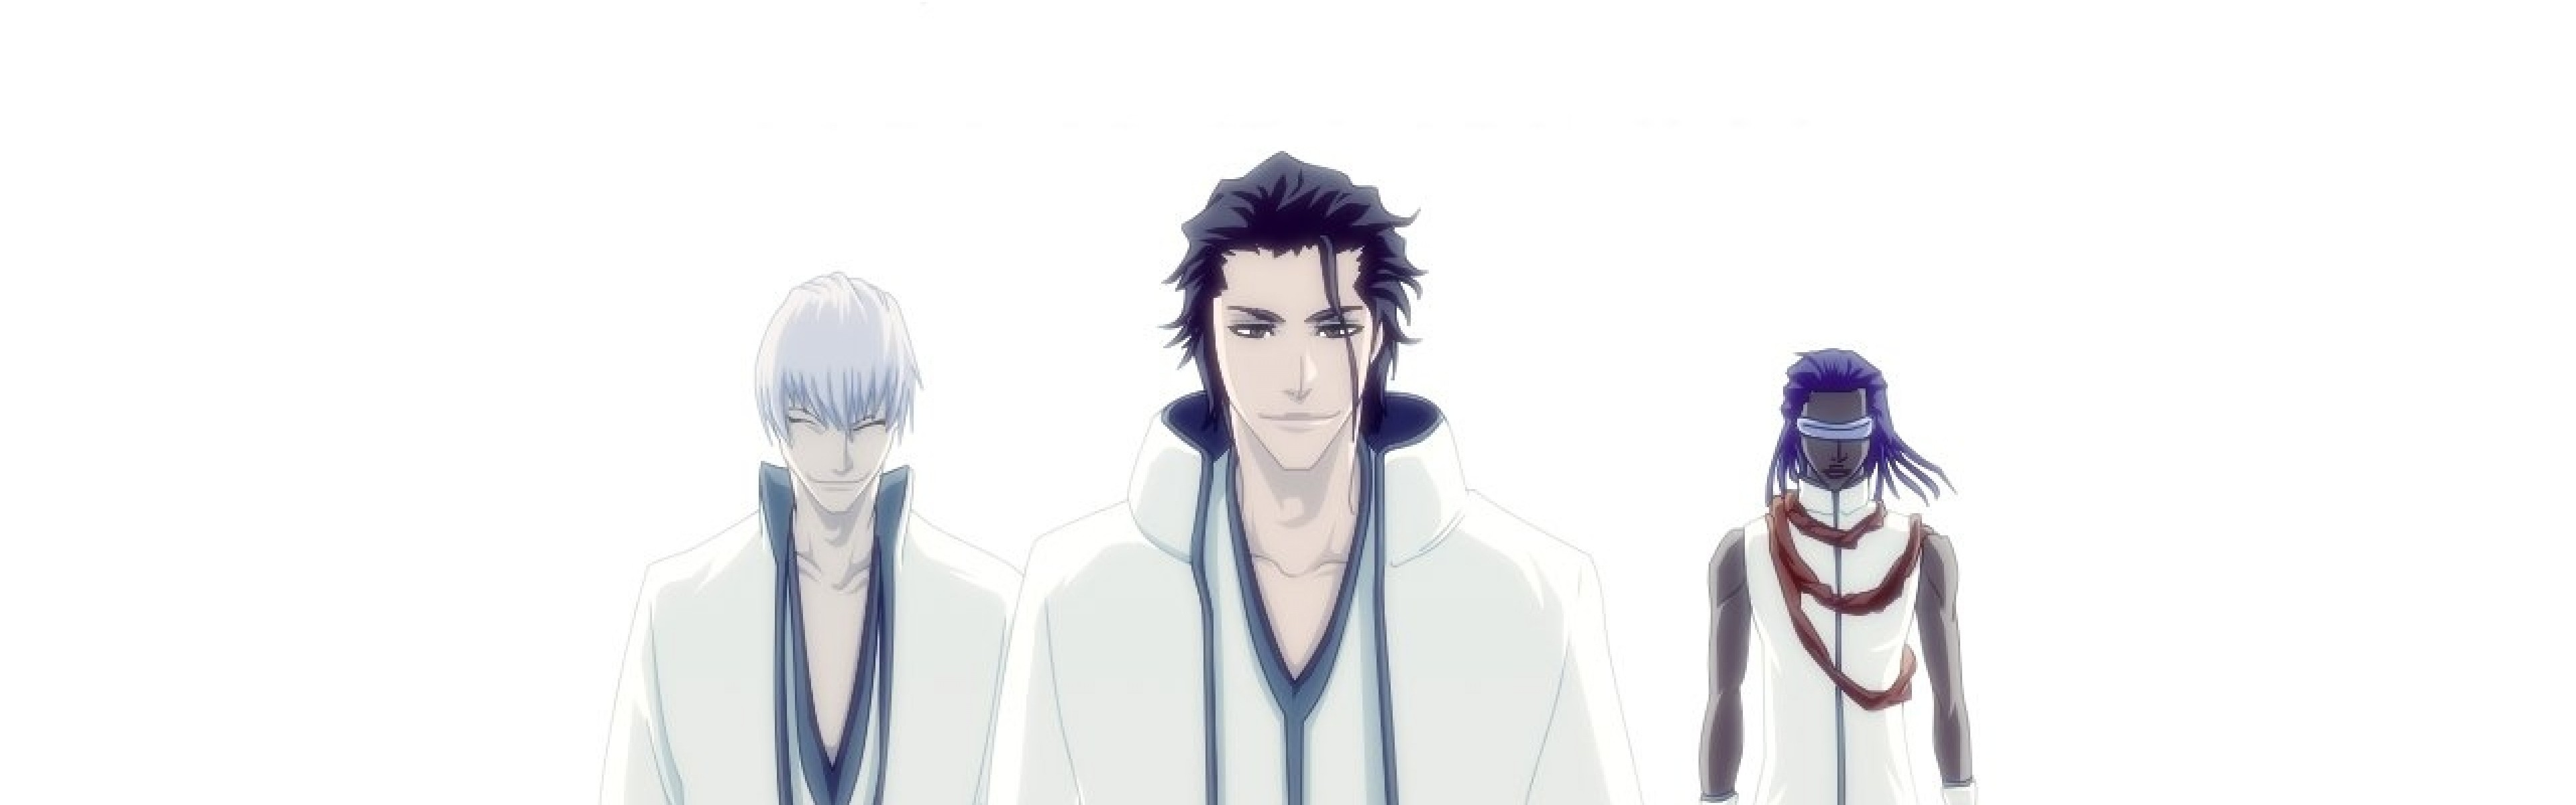 Wallpaper bleach, ichimaru gin, aizen sousuke, tousen kaname,  boys, clothes